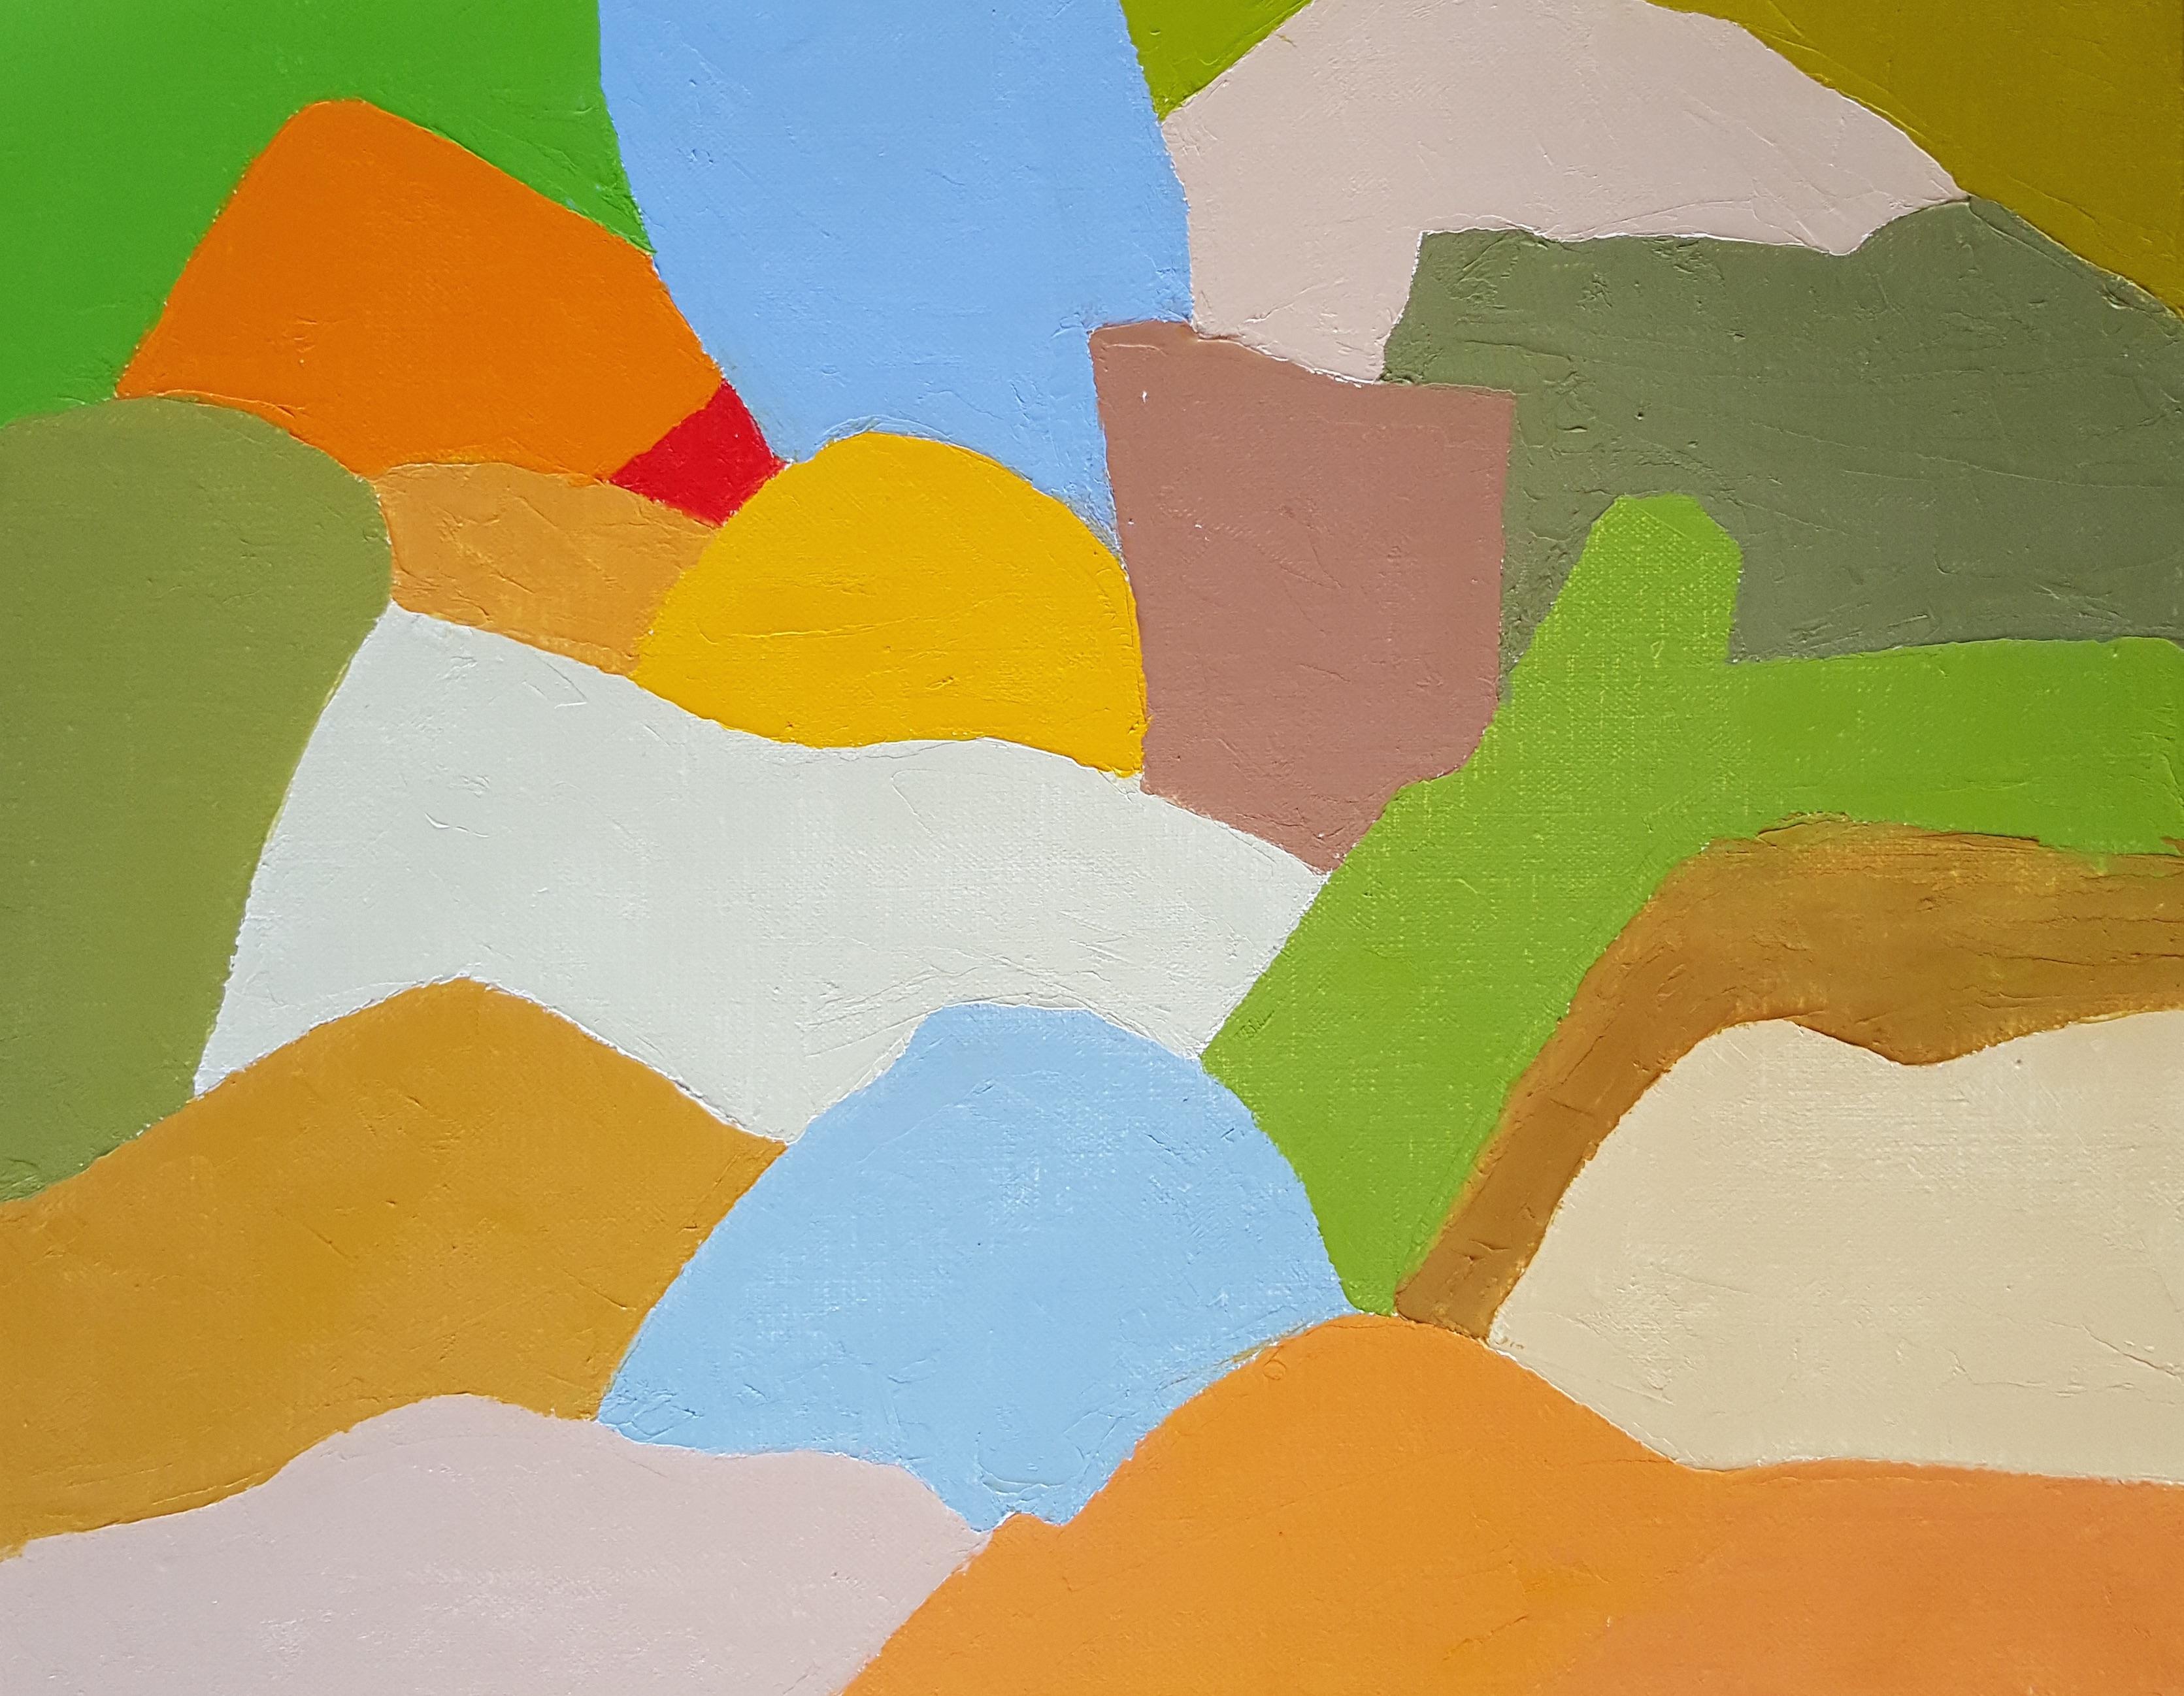 Etel Adnan, Untitled, 2015, oil on canvas, 33 x 41 cm (courtesy of Sfeir Semler